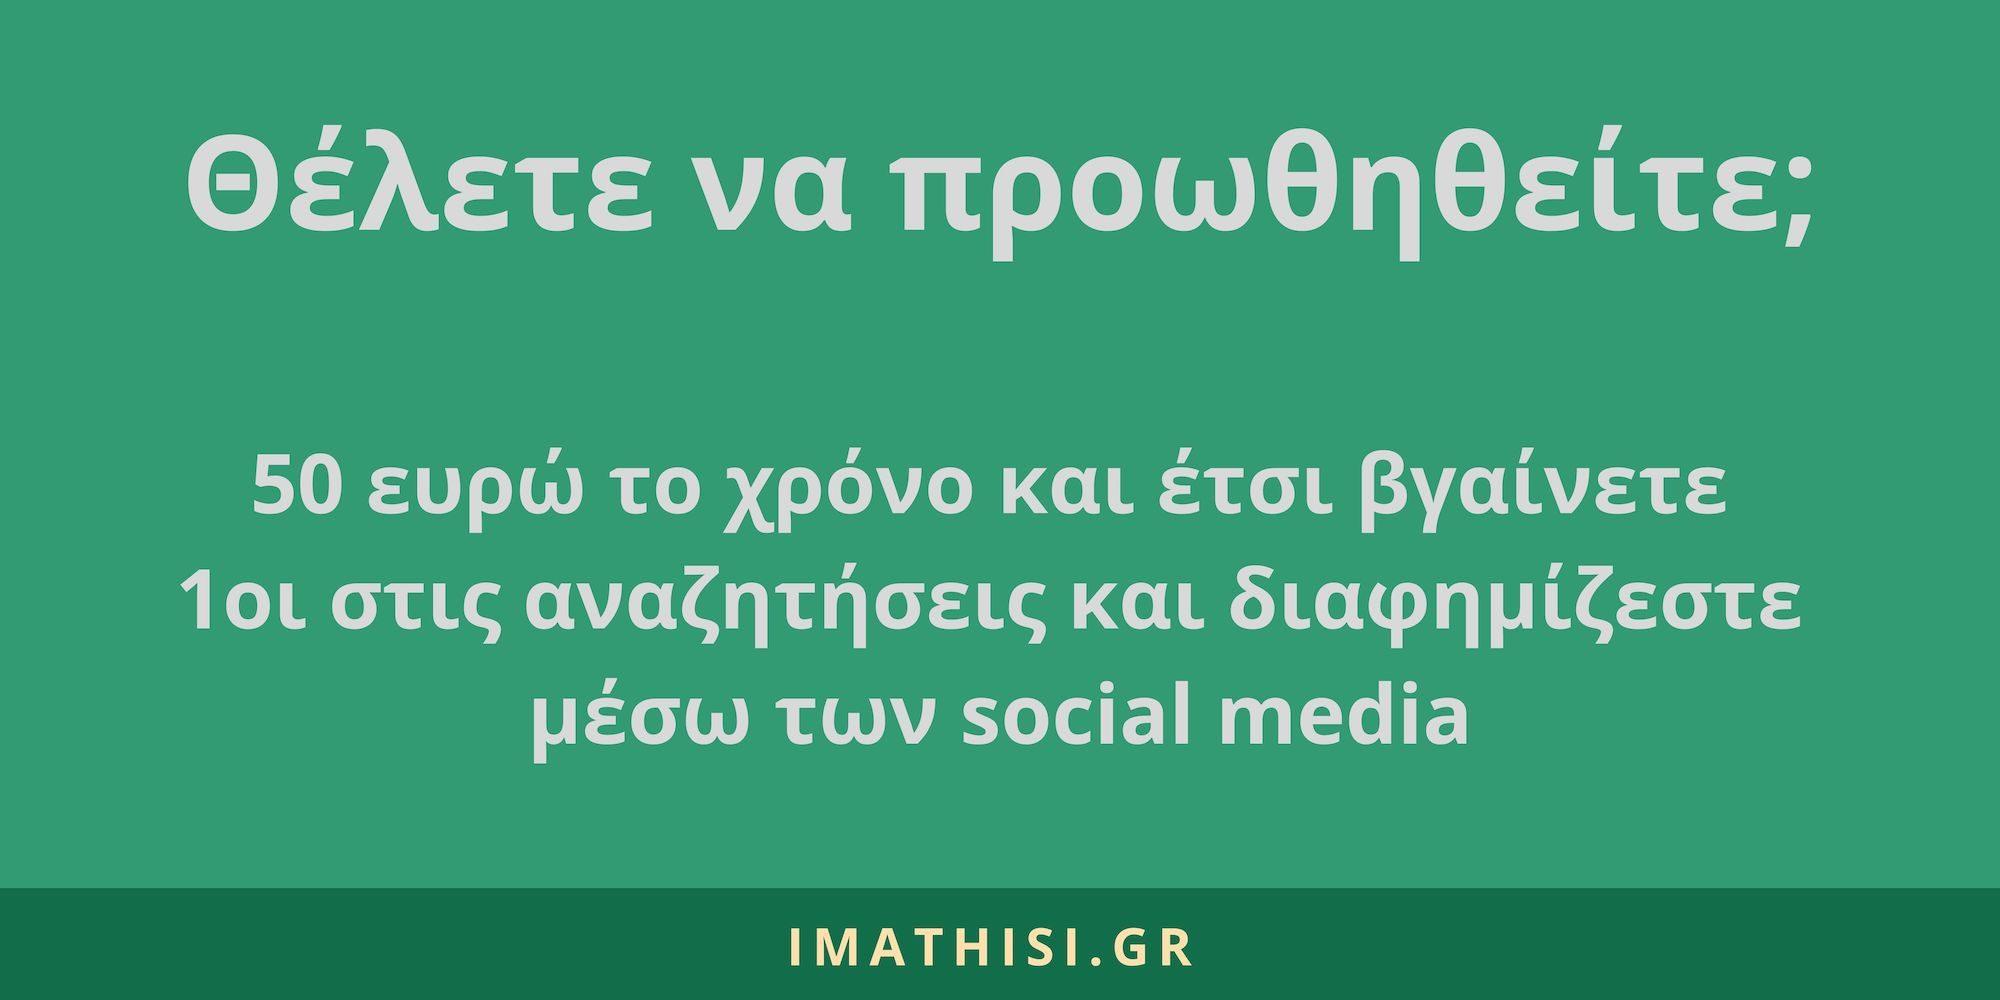 imathisi.gr